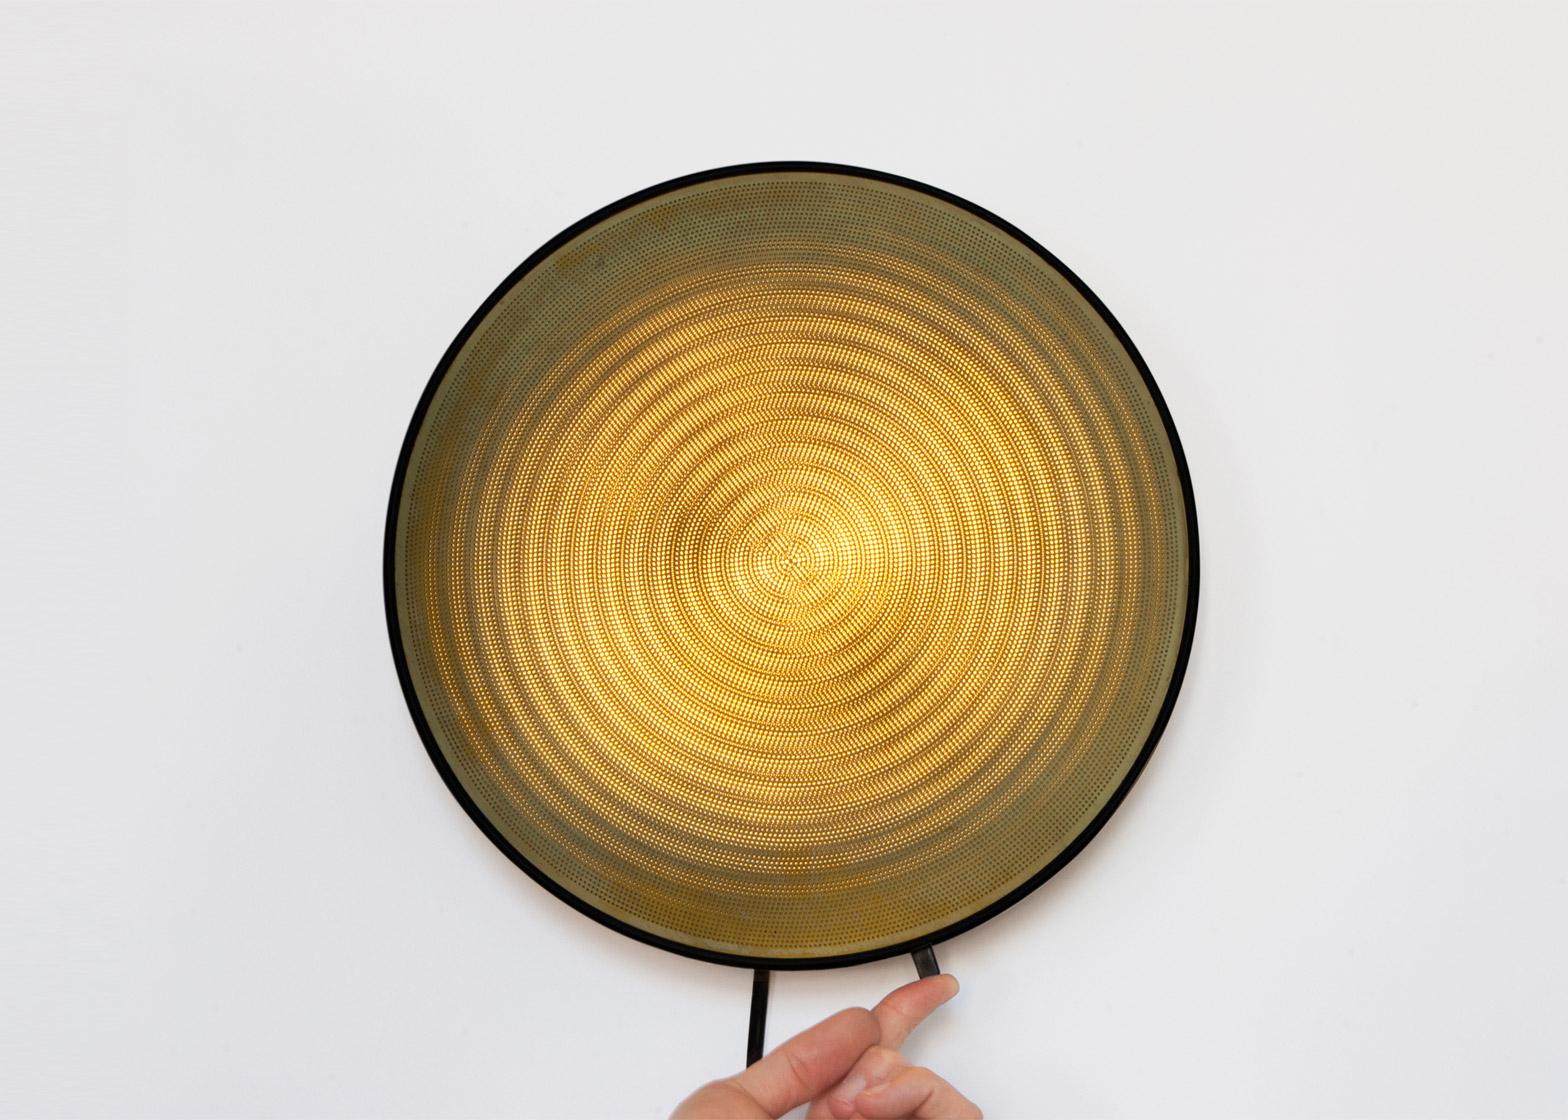 Moire lights by David Derksen